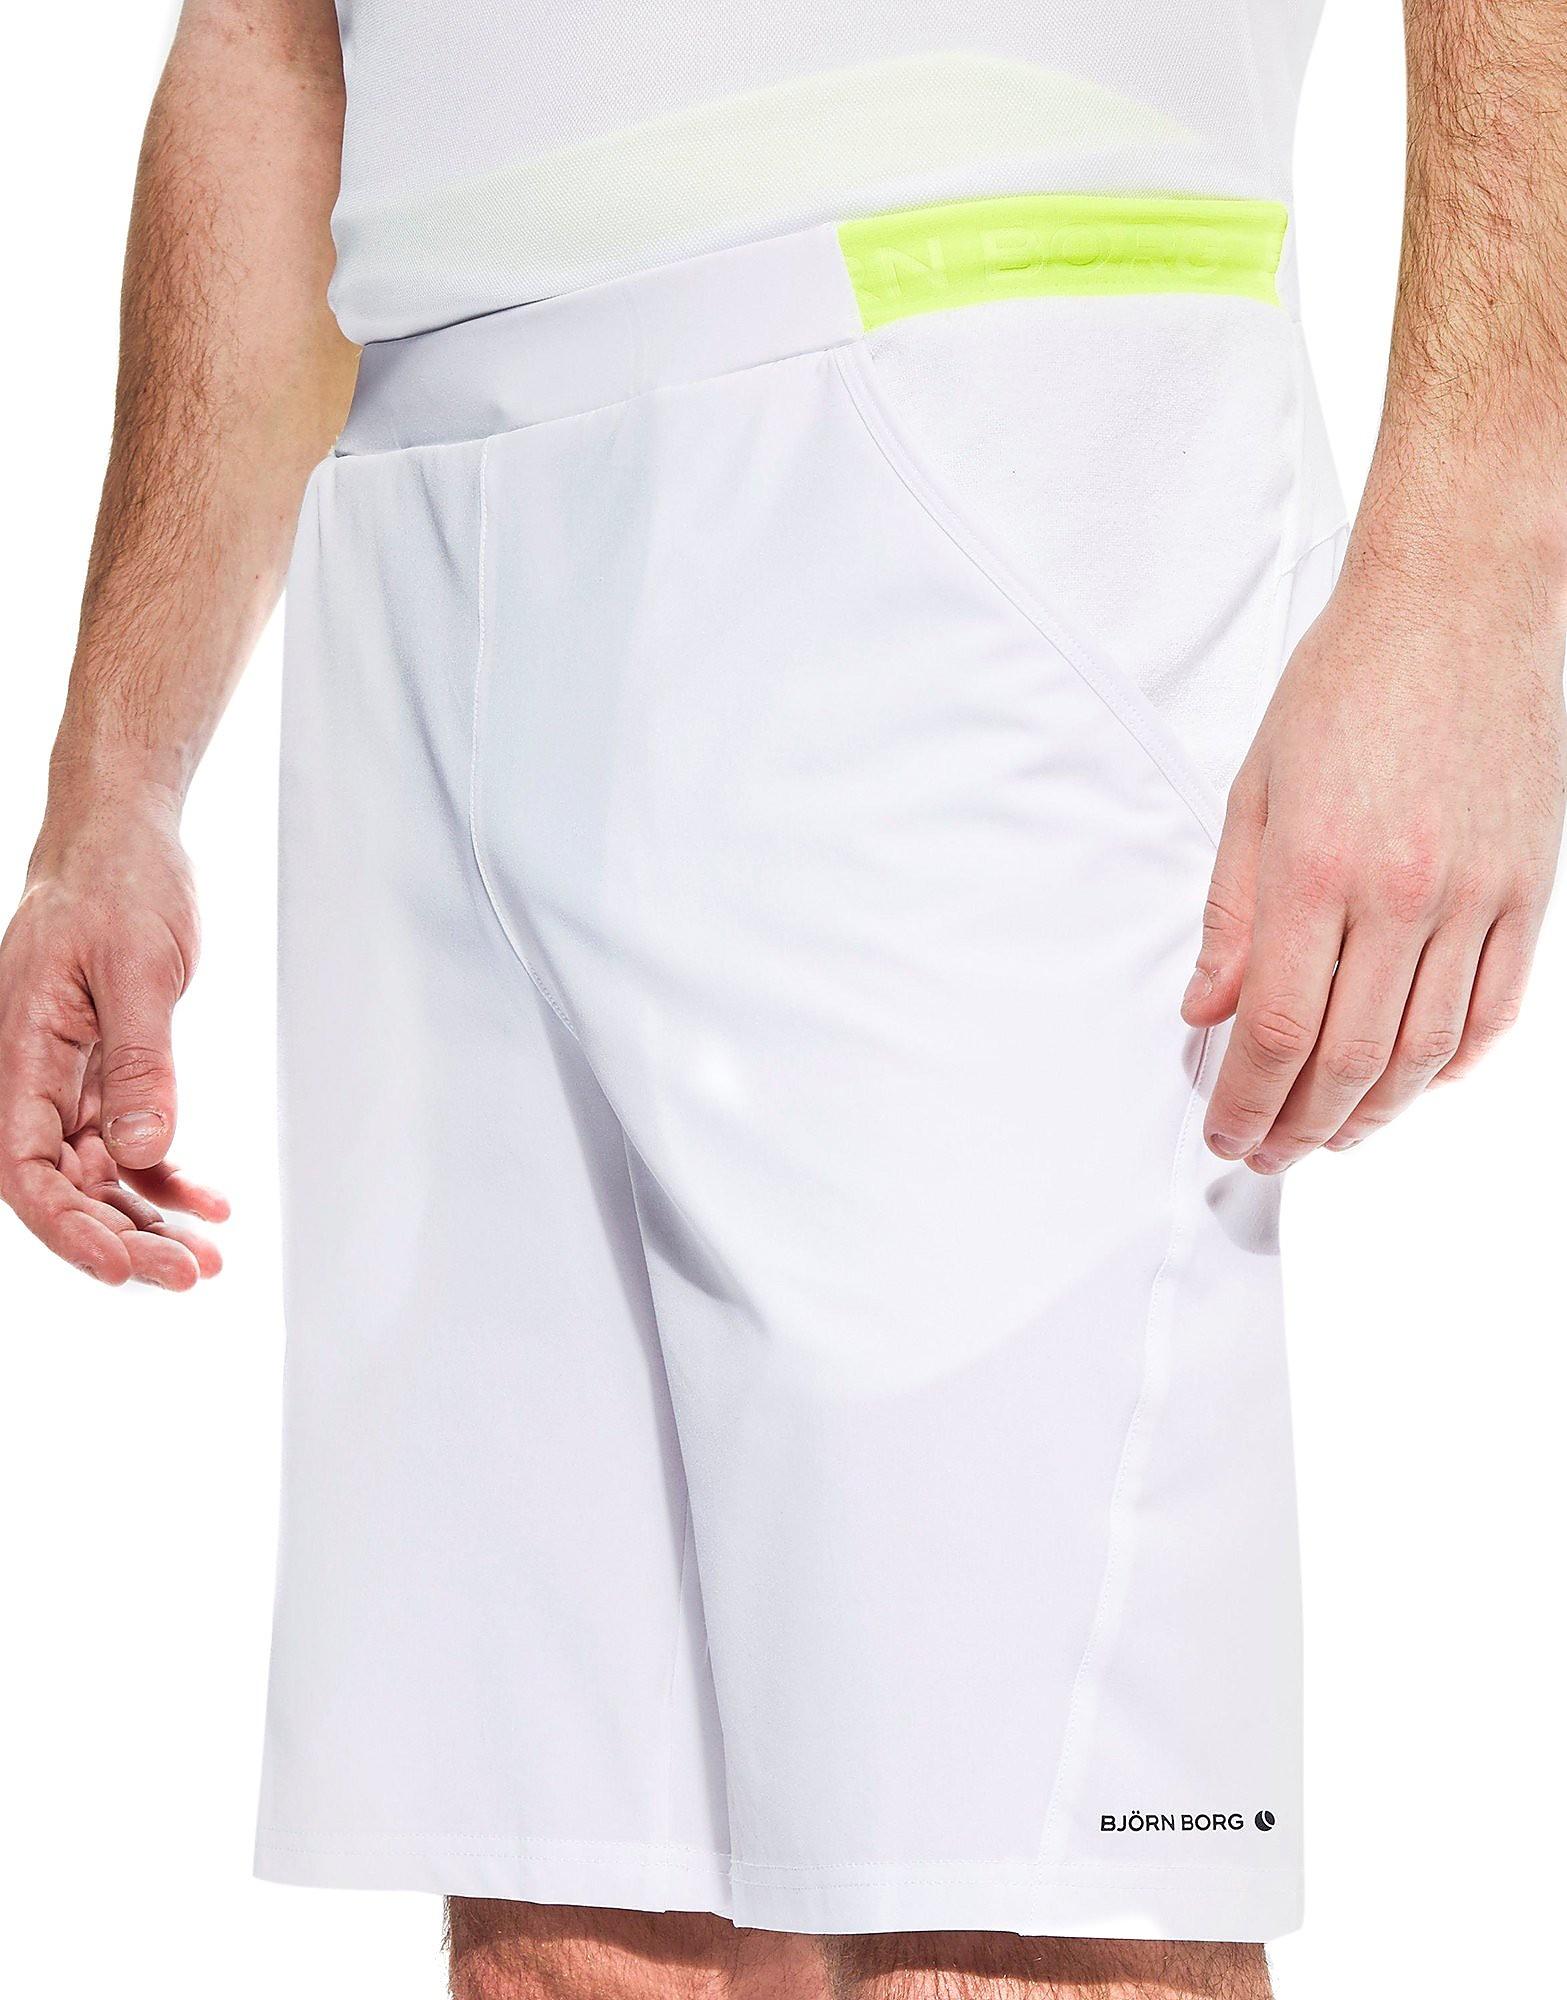 Bjorn Borg Tarik Tennis Shorts